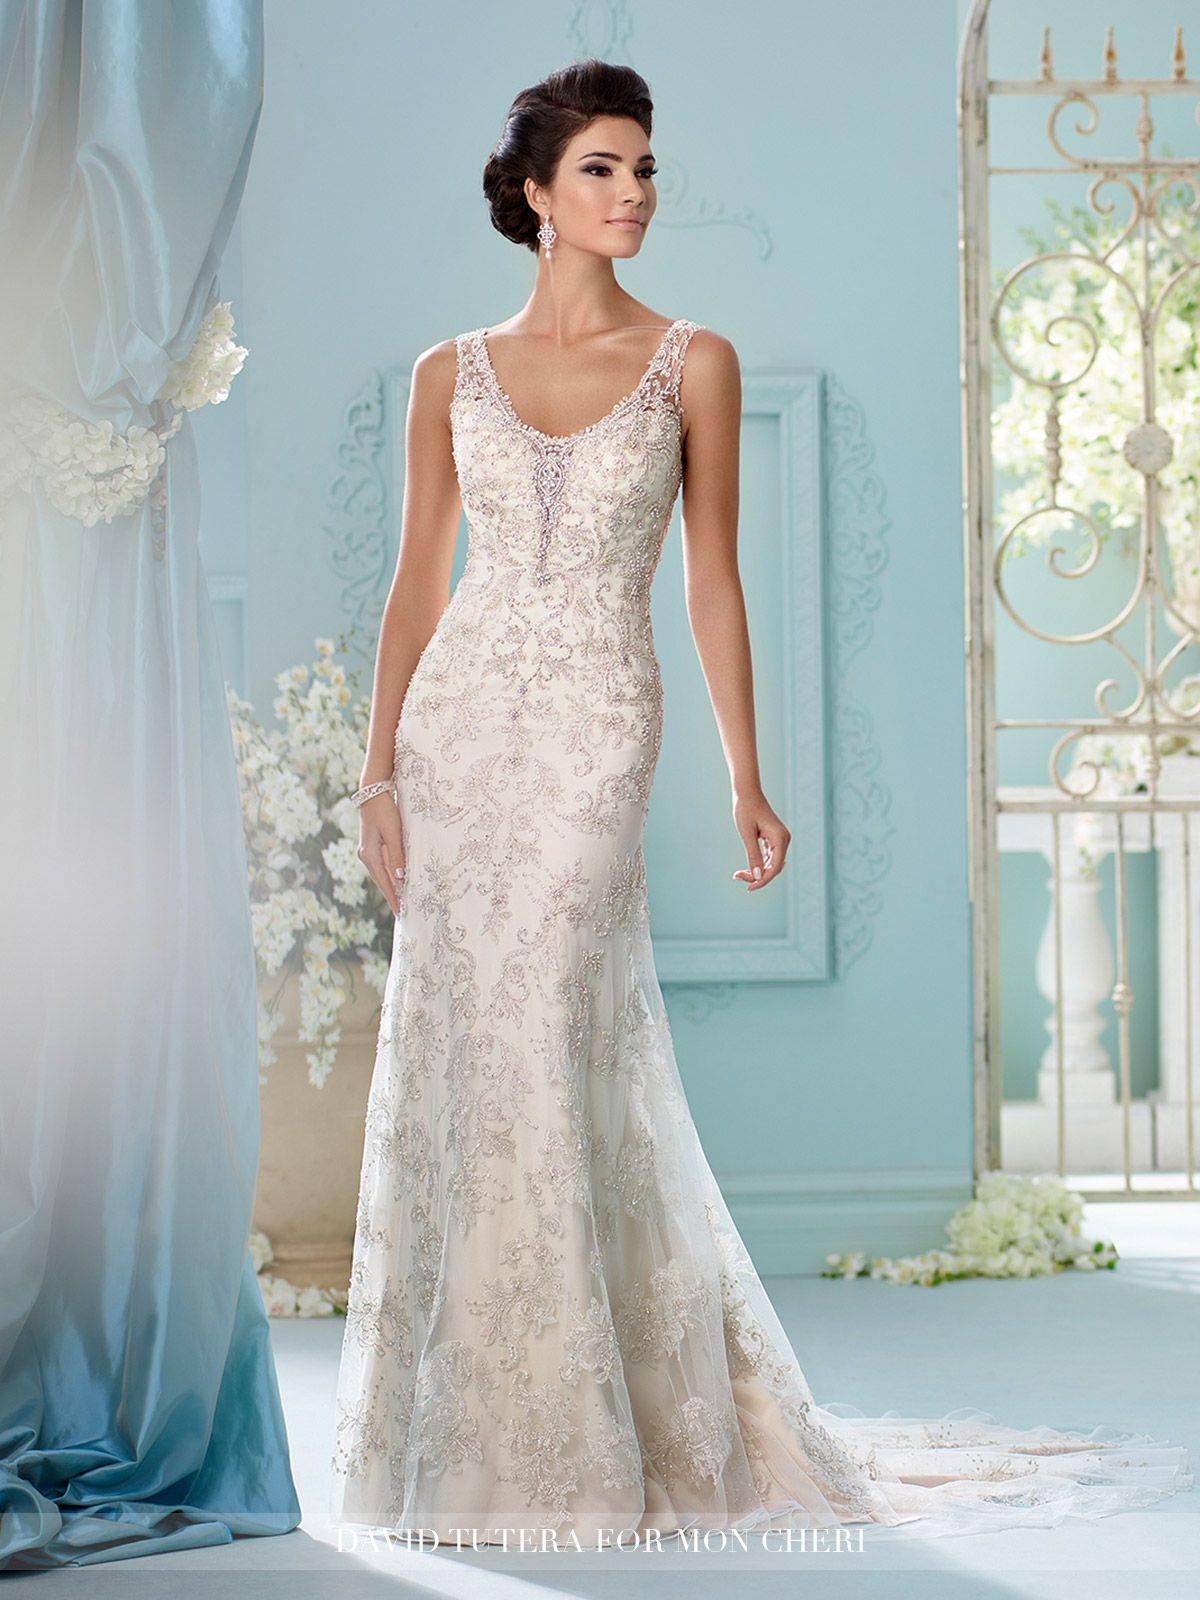 Unique Wedding Dresses Fall 2018 - Martin Thornburg | Embroidered ...